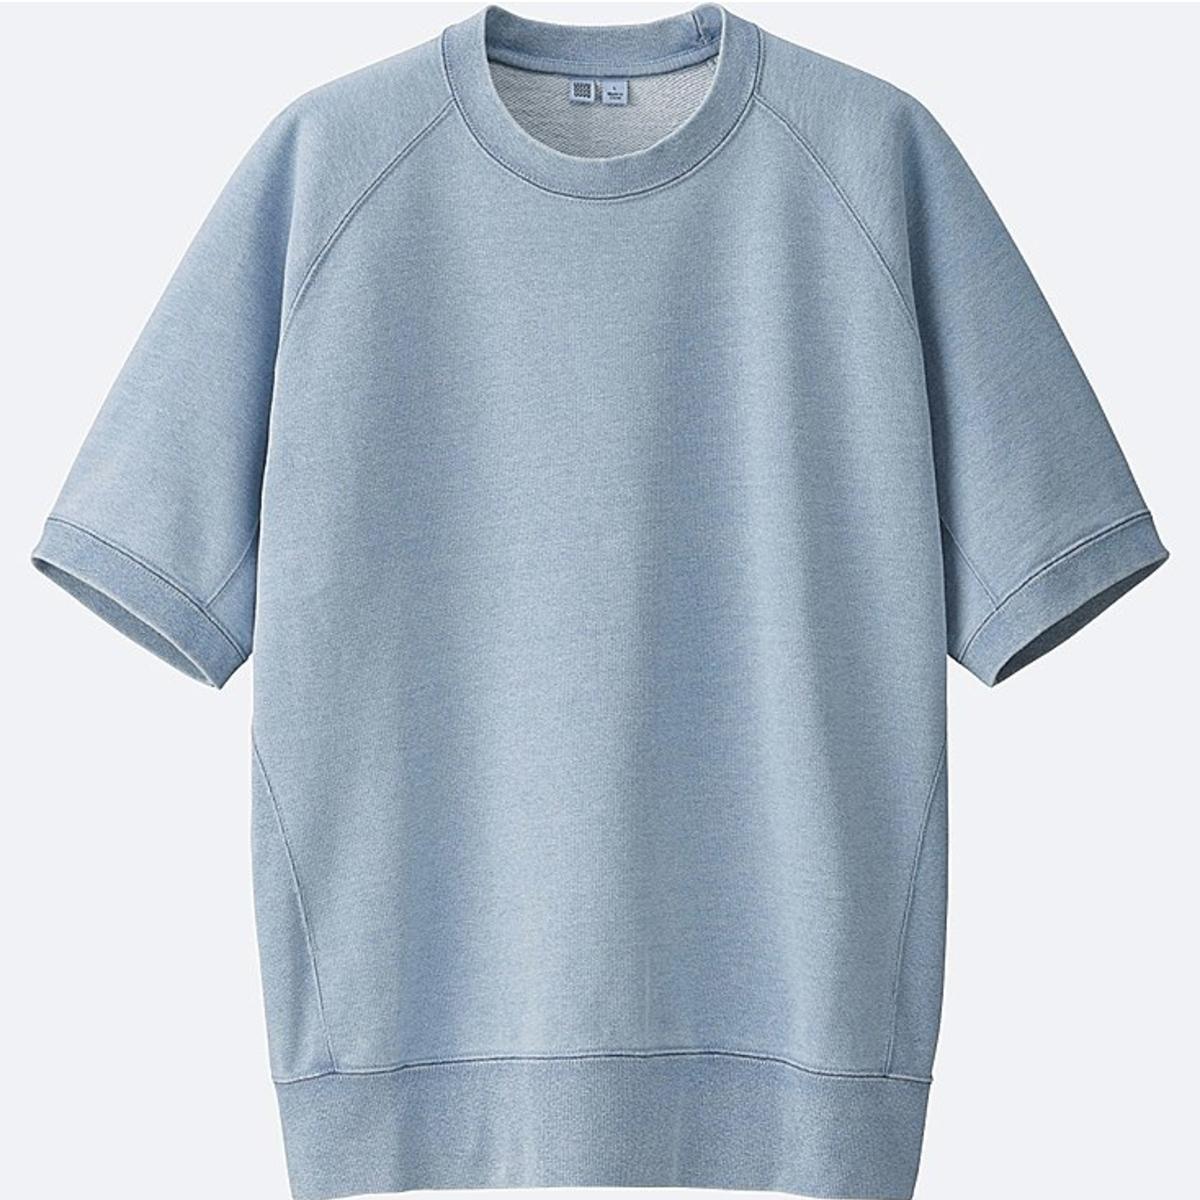 sam-c-perry-short-sleeve-sweatshirt-oversized-relaxed-denim-uniqlo-u-sweatshirt.jpg